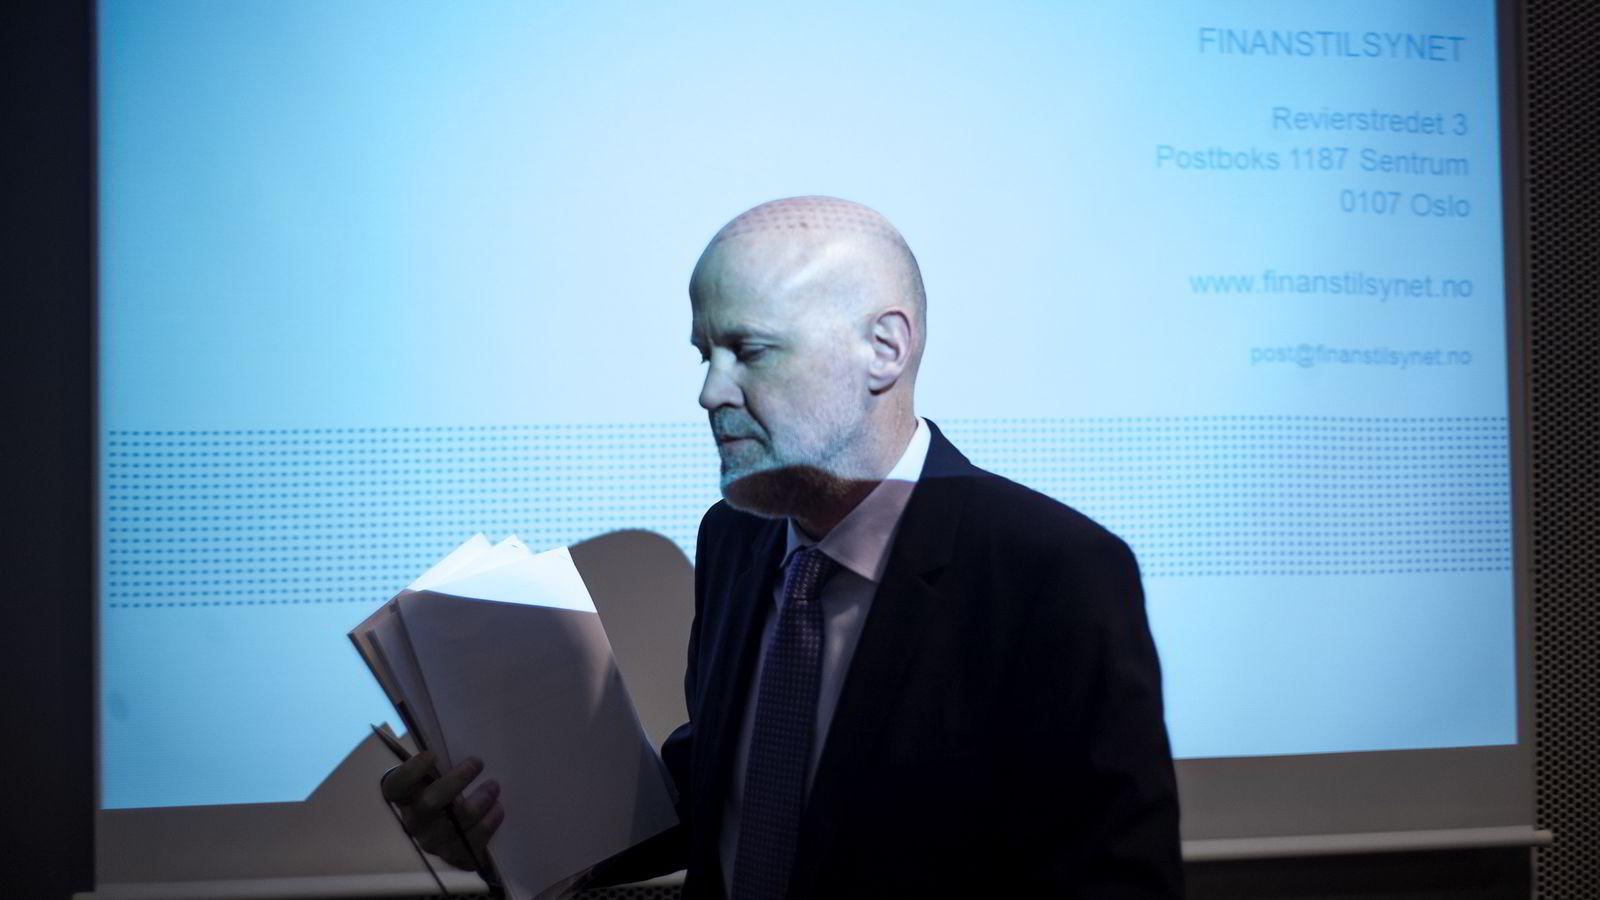 Finanstilsynsdirektør Morten Baltzersen analyserer veien videre for norsk økonomi.